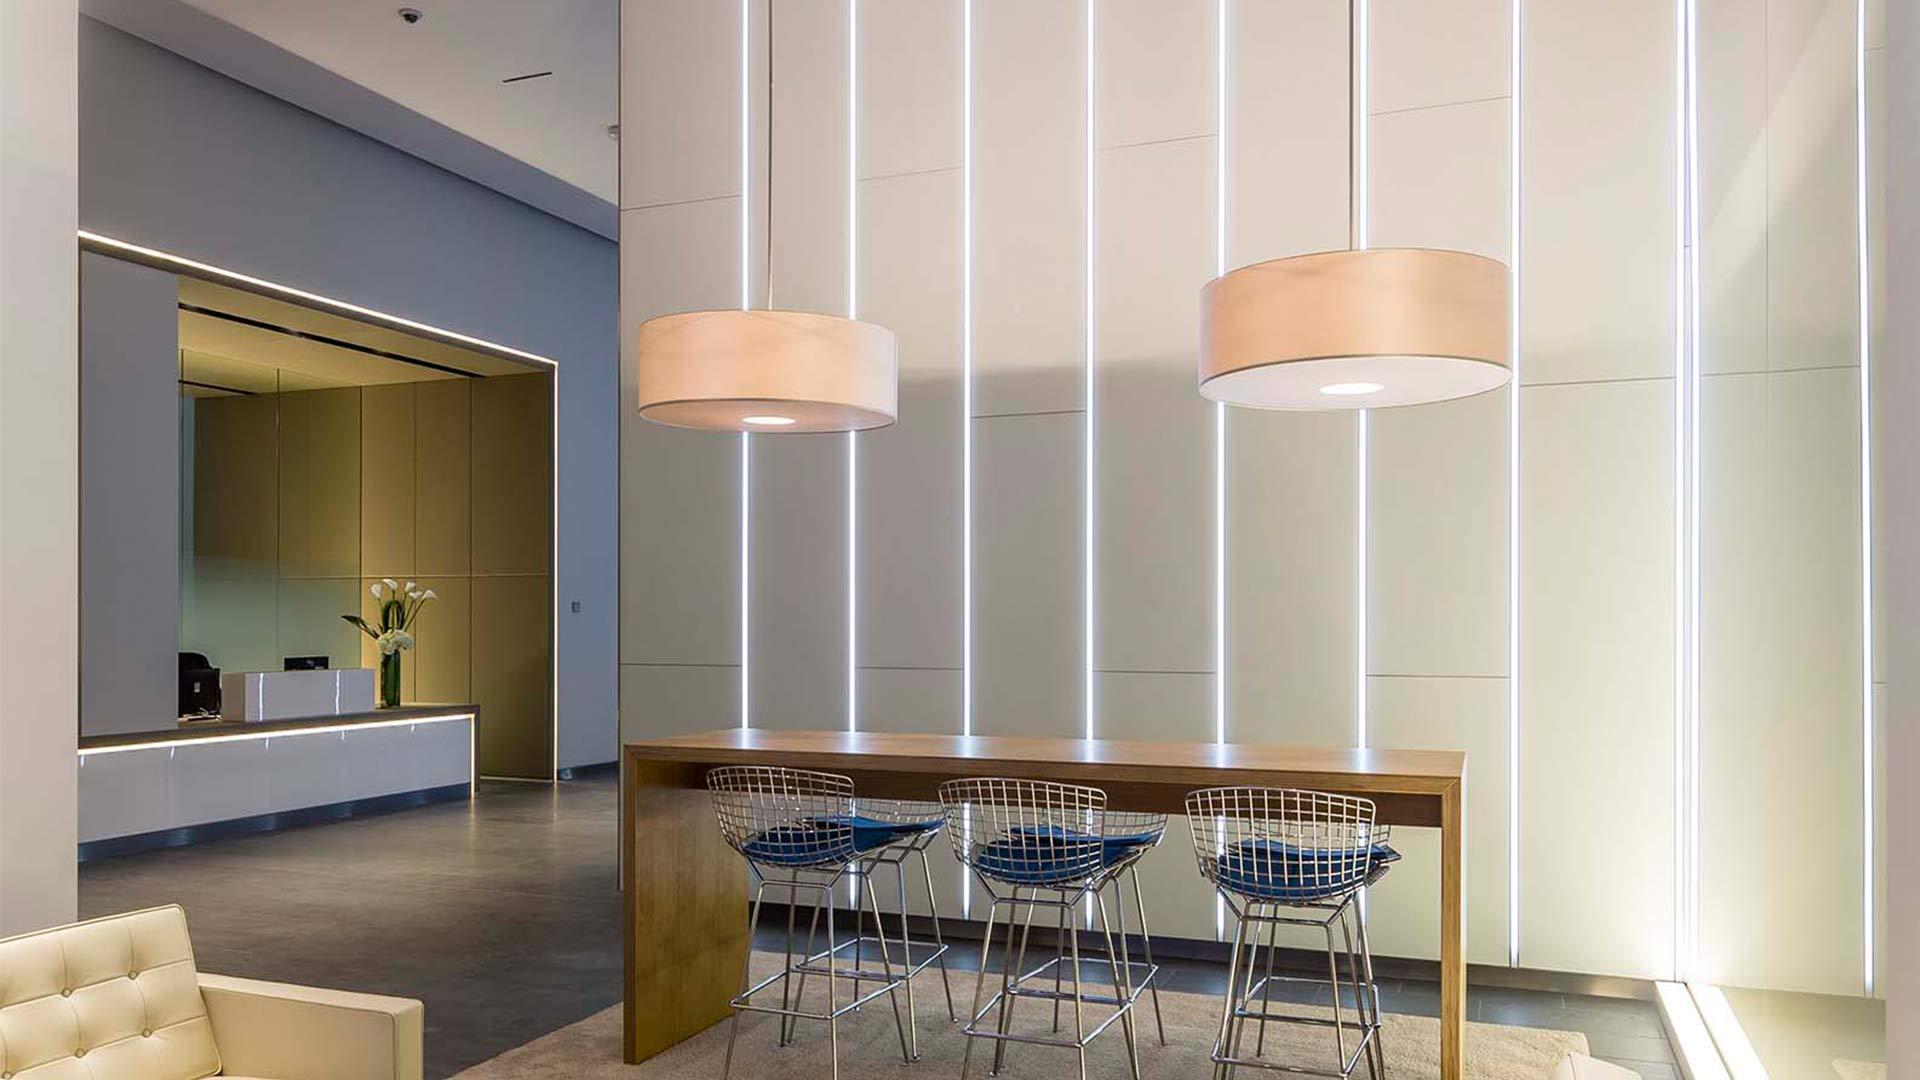 Foyer Lighting Trends lighting trends 2016 | nulty | lighting design consultants